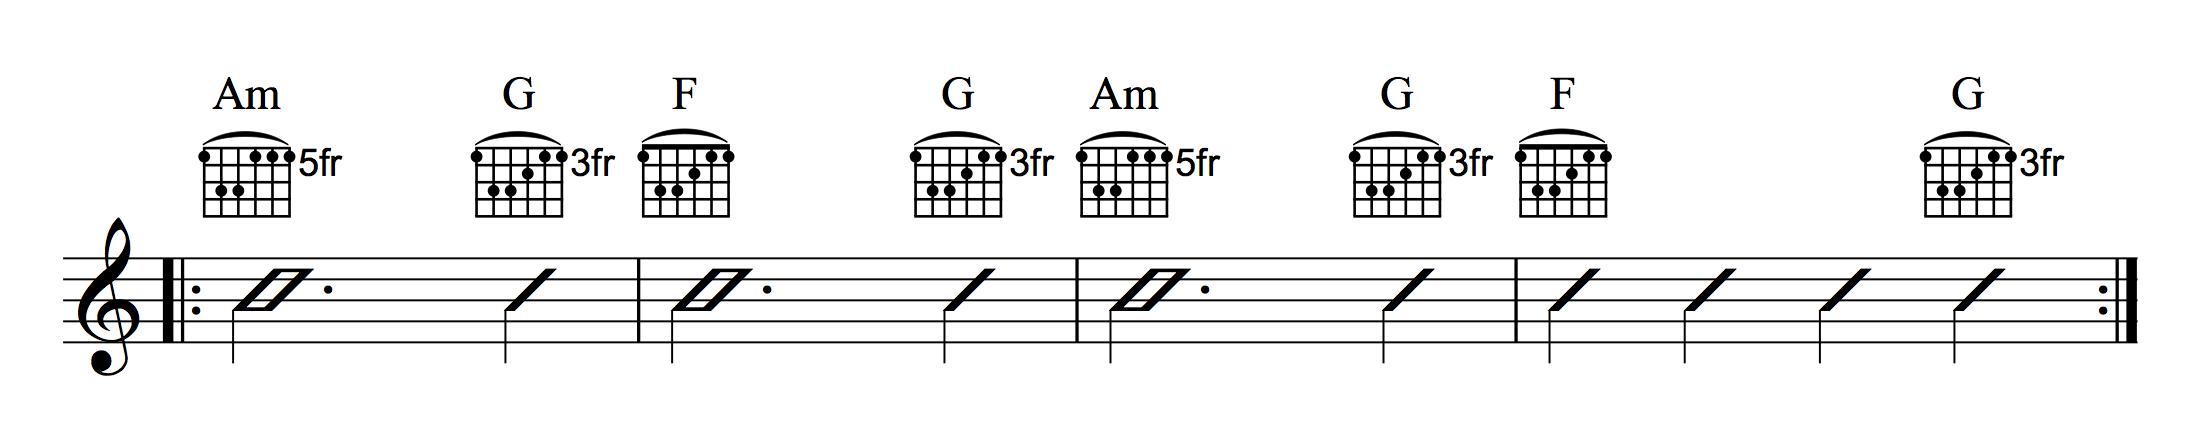 minor-barre-chord-progression-1.png